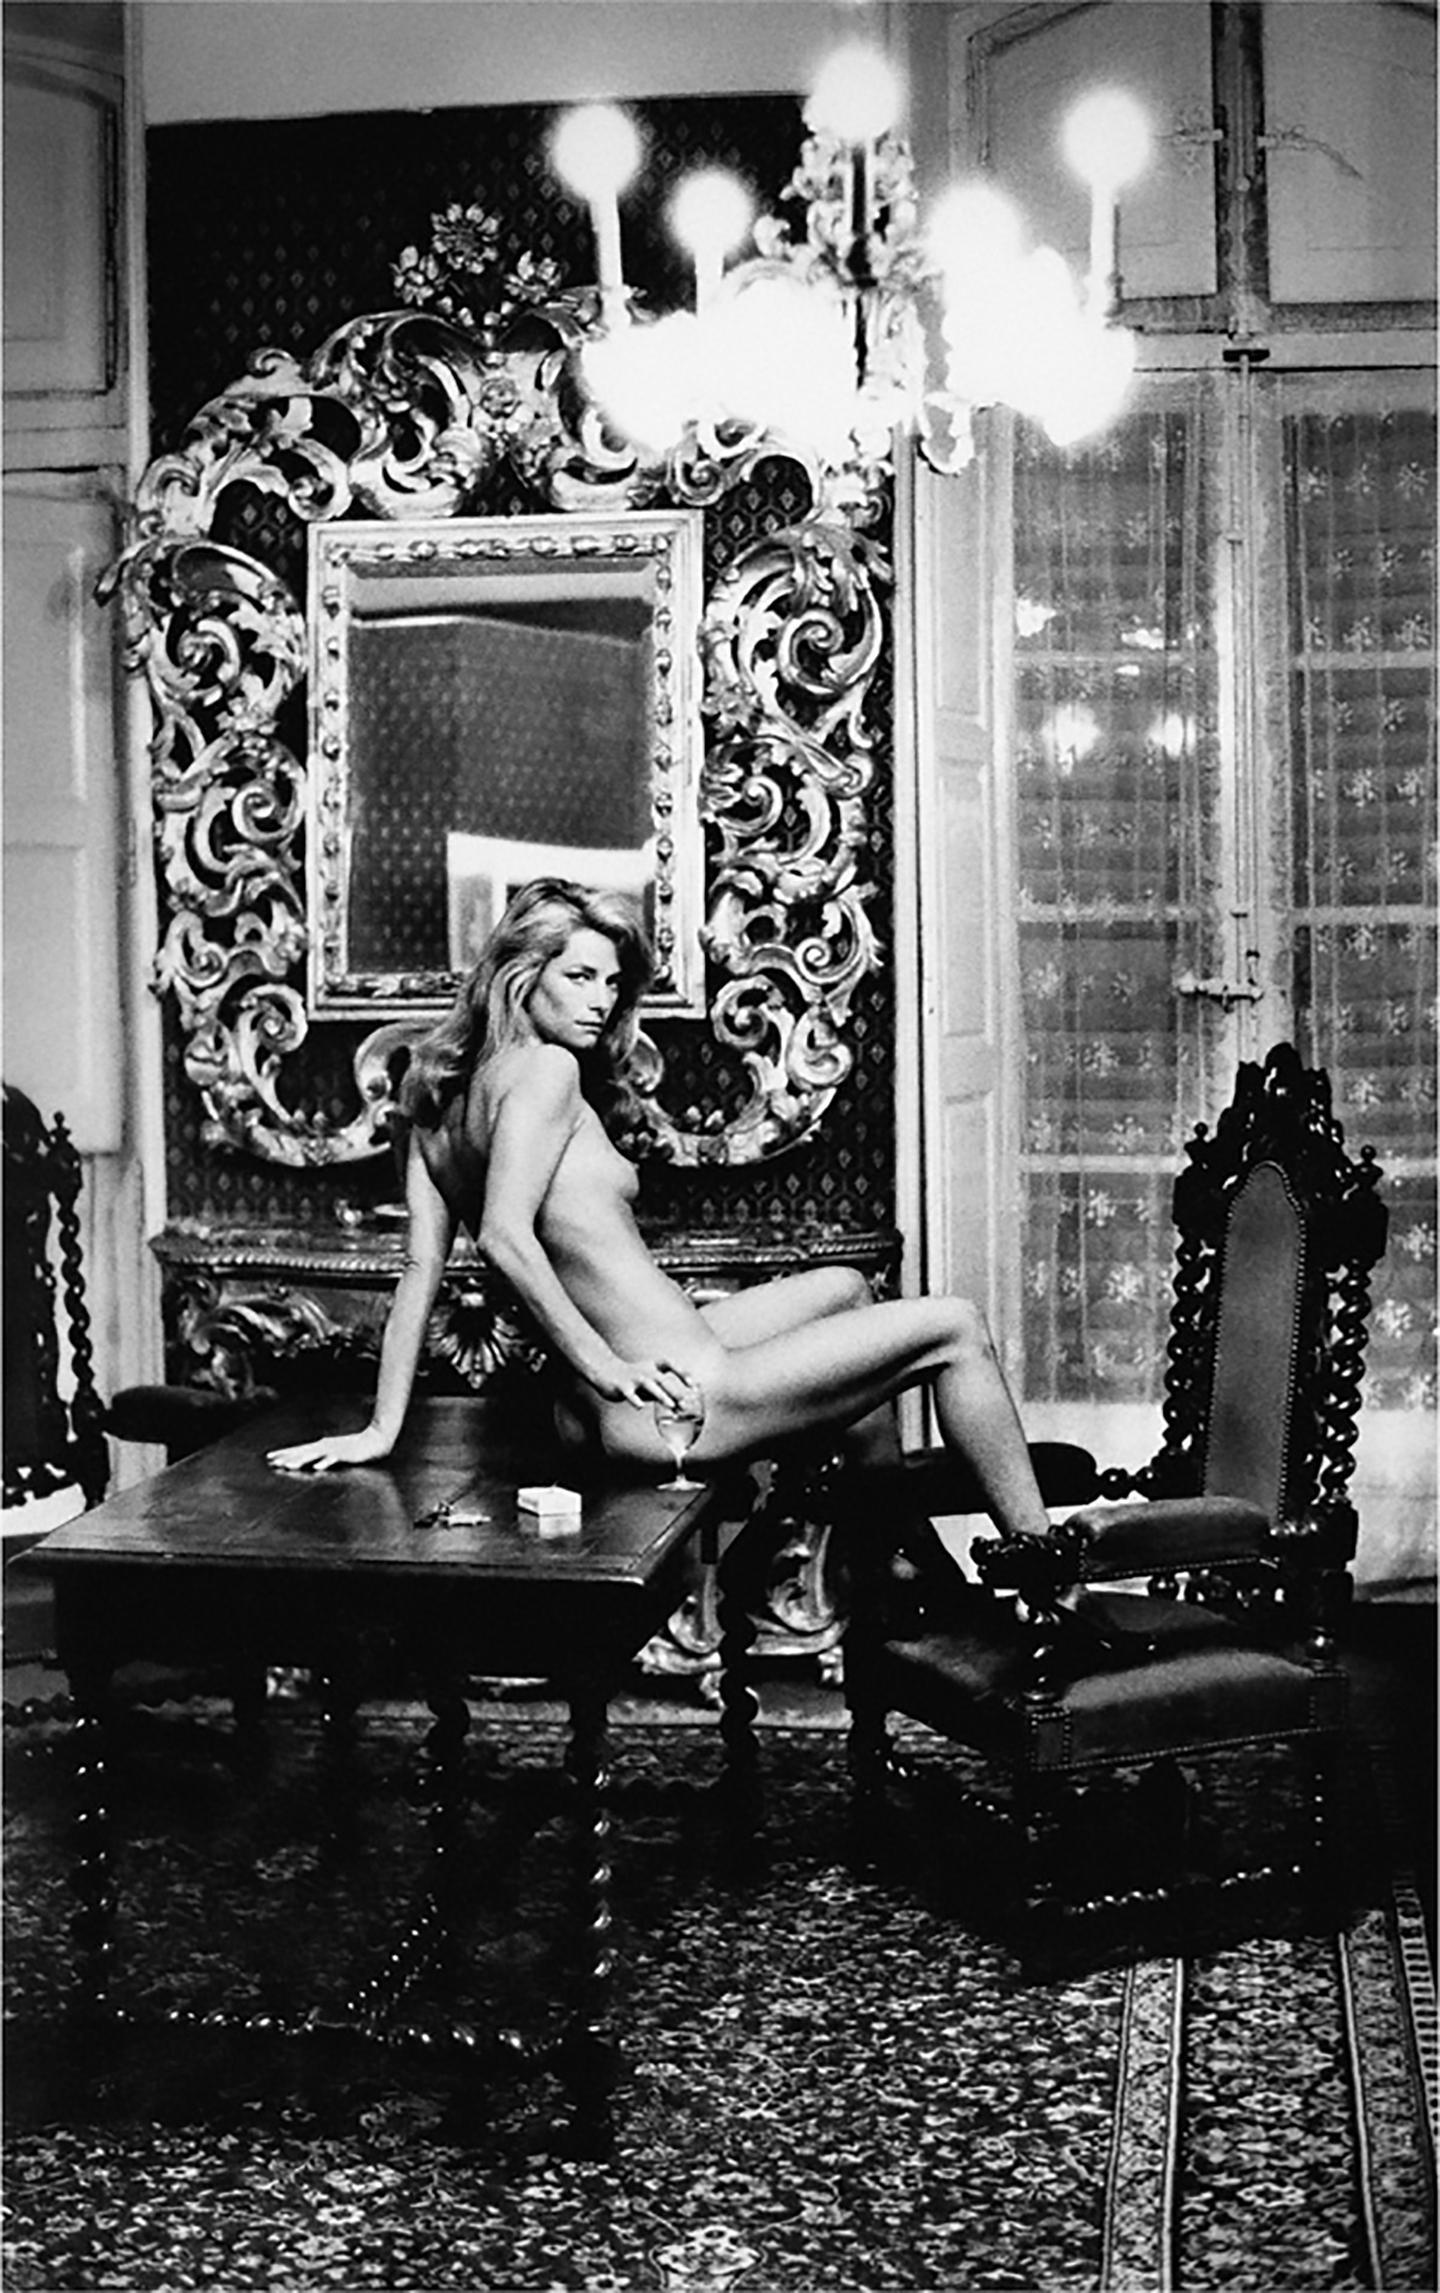 Charlotte Rampling at Hotel Nord, Paris Pinus, Arles, France, 1973 signed